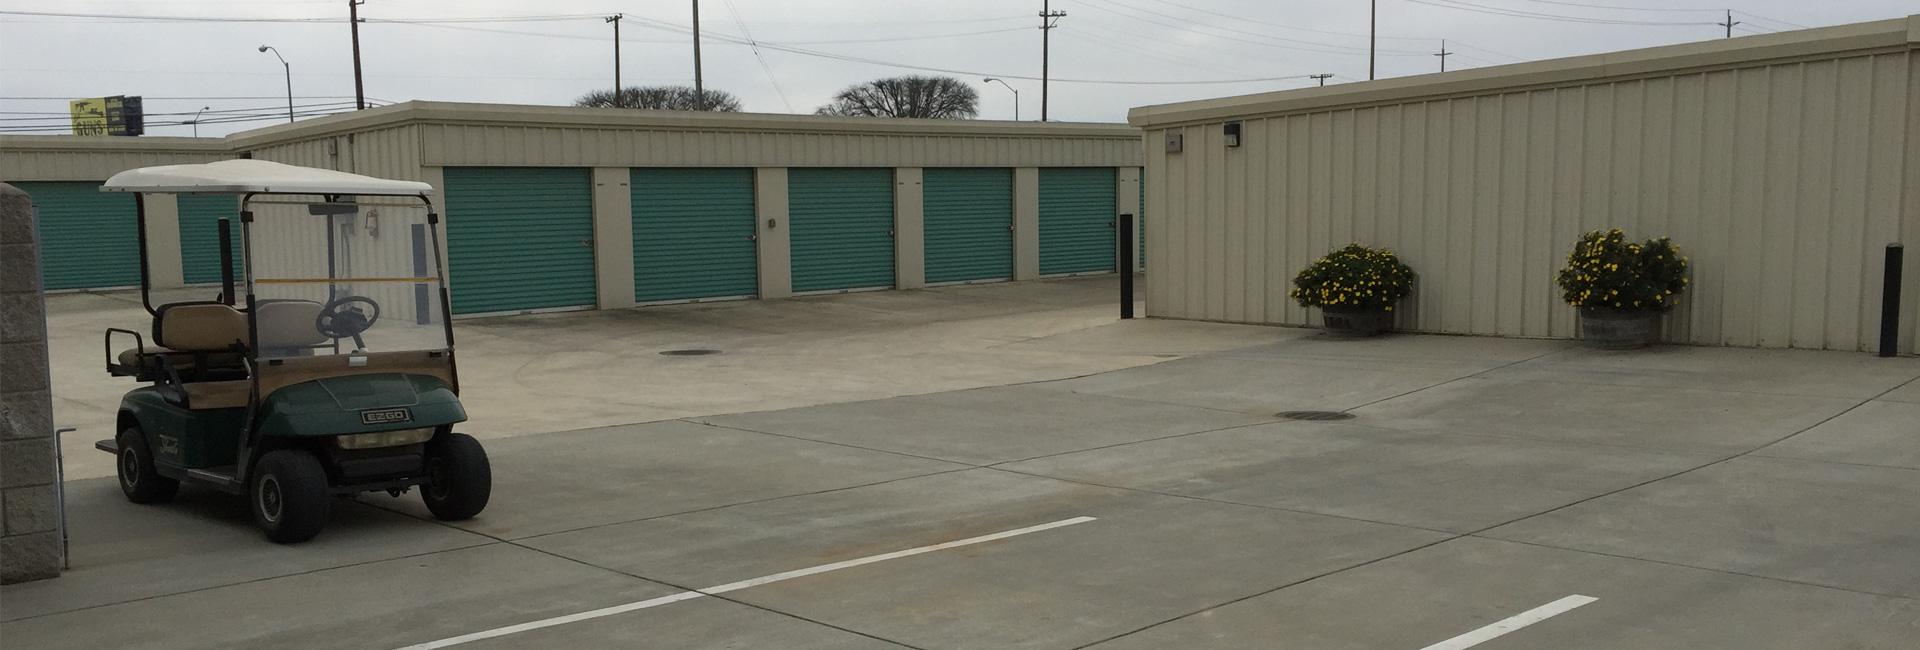 Storage Lodi California Ppi Blog